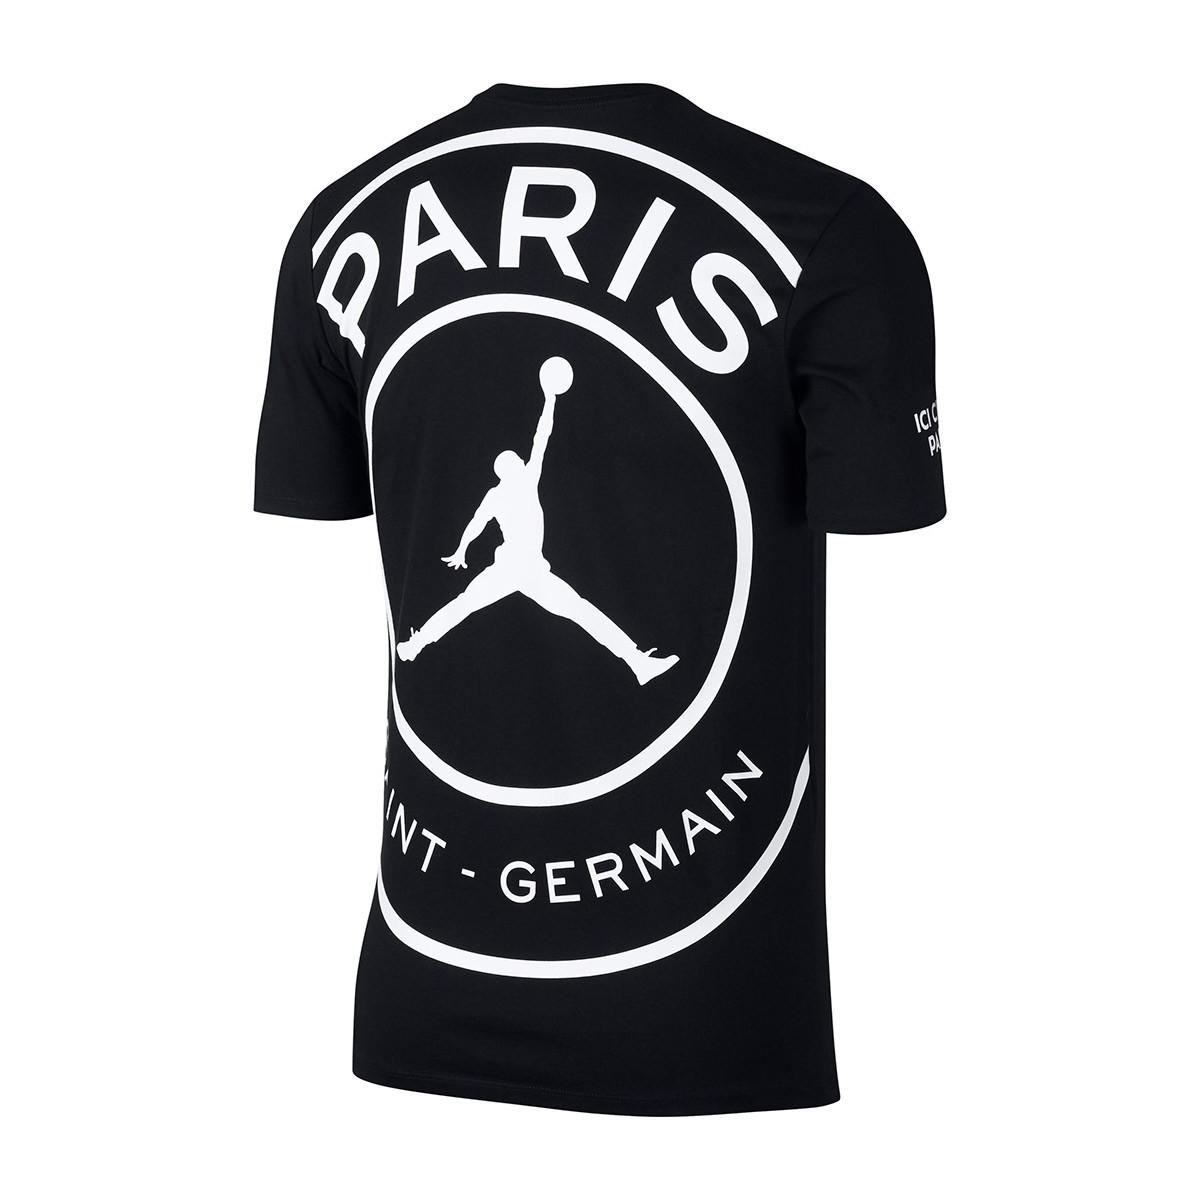 dcdd946b2d6af1 Jersey Nike Jordan x PSG SS Black-White - Tienda de fútbol Fútbol Emotion